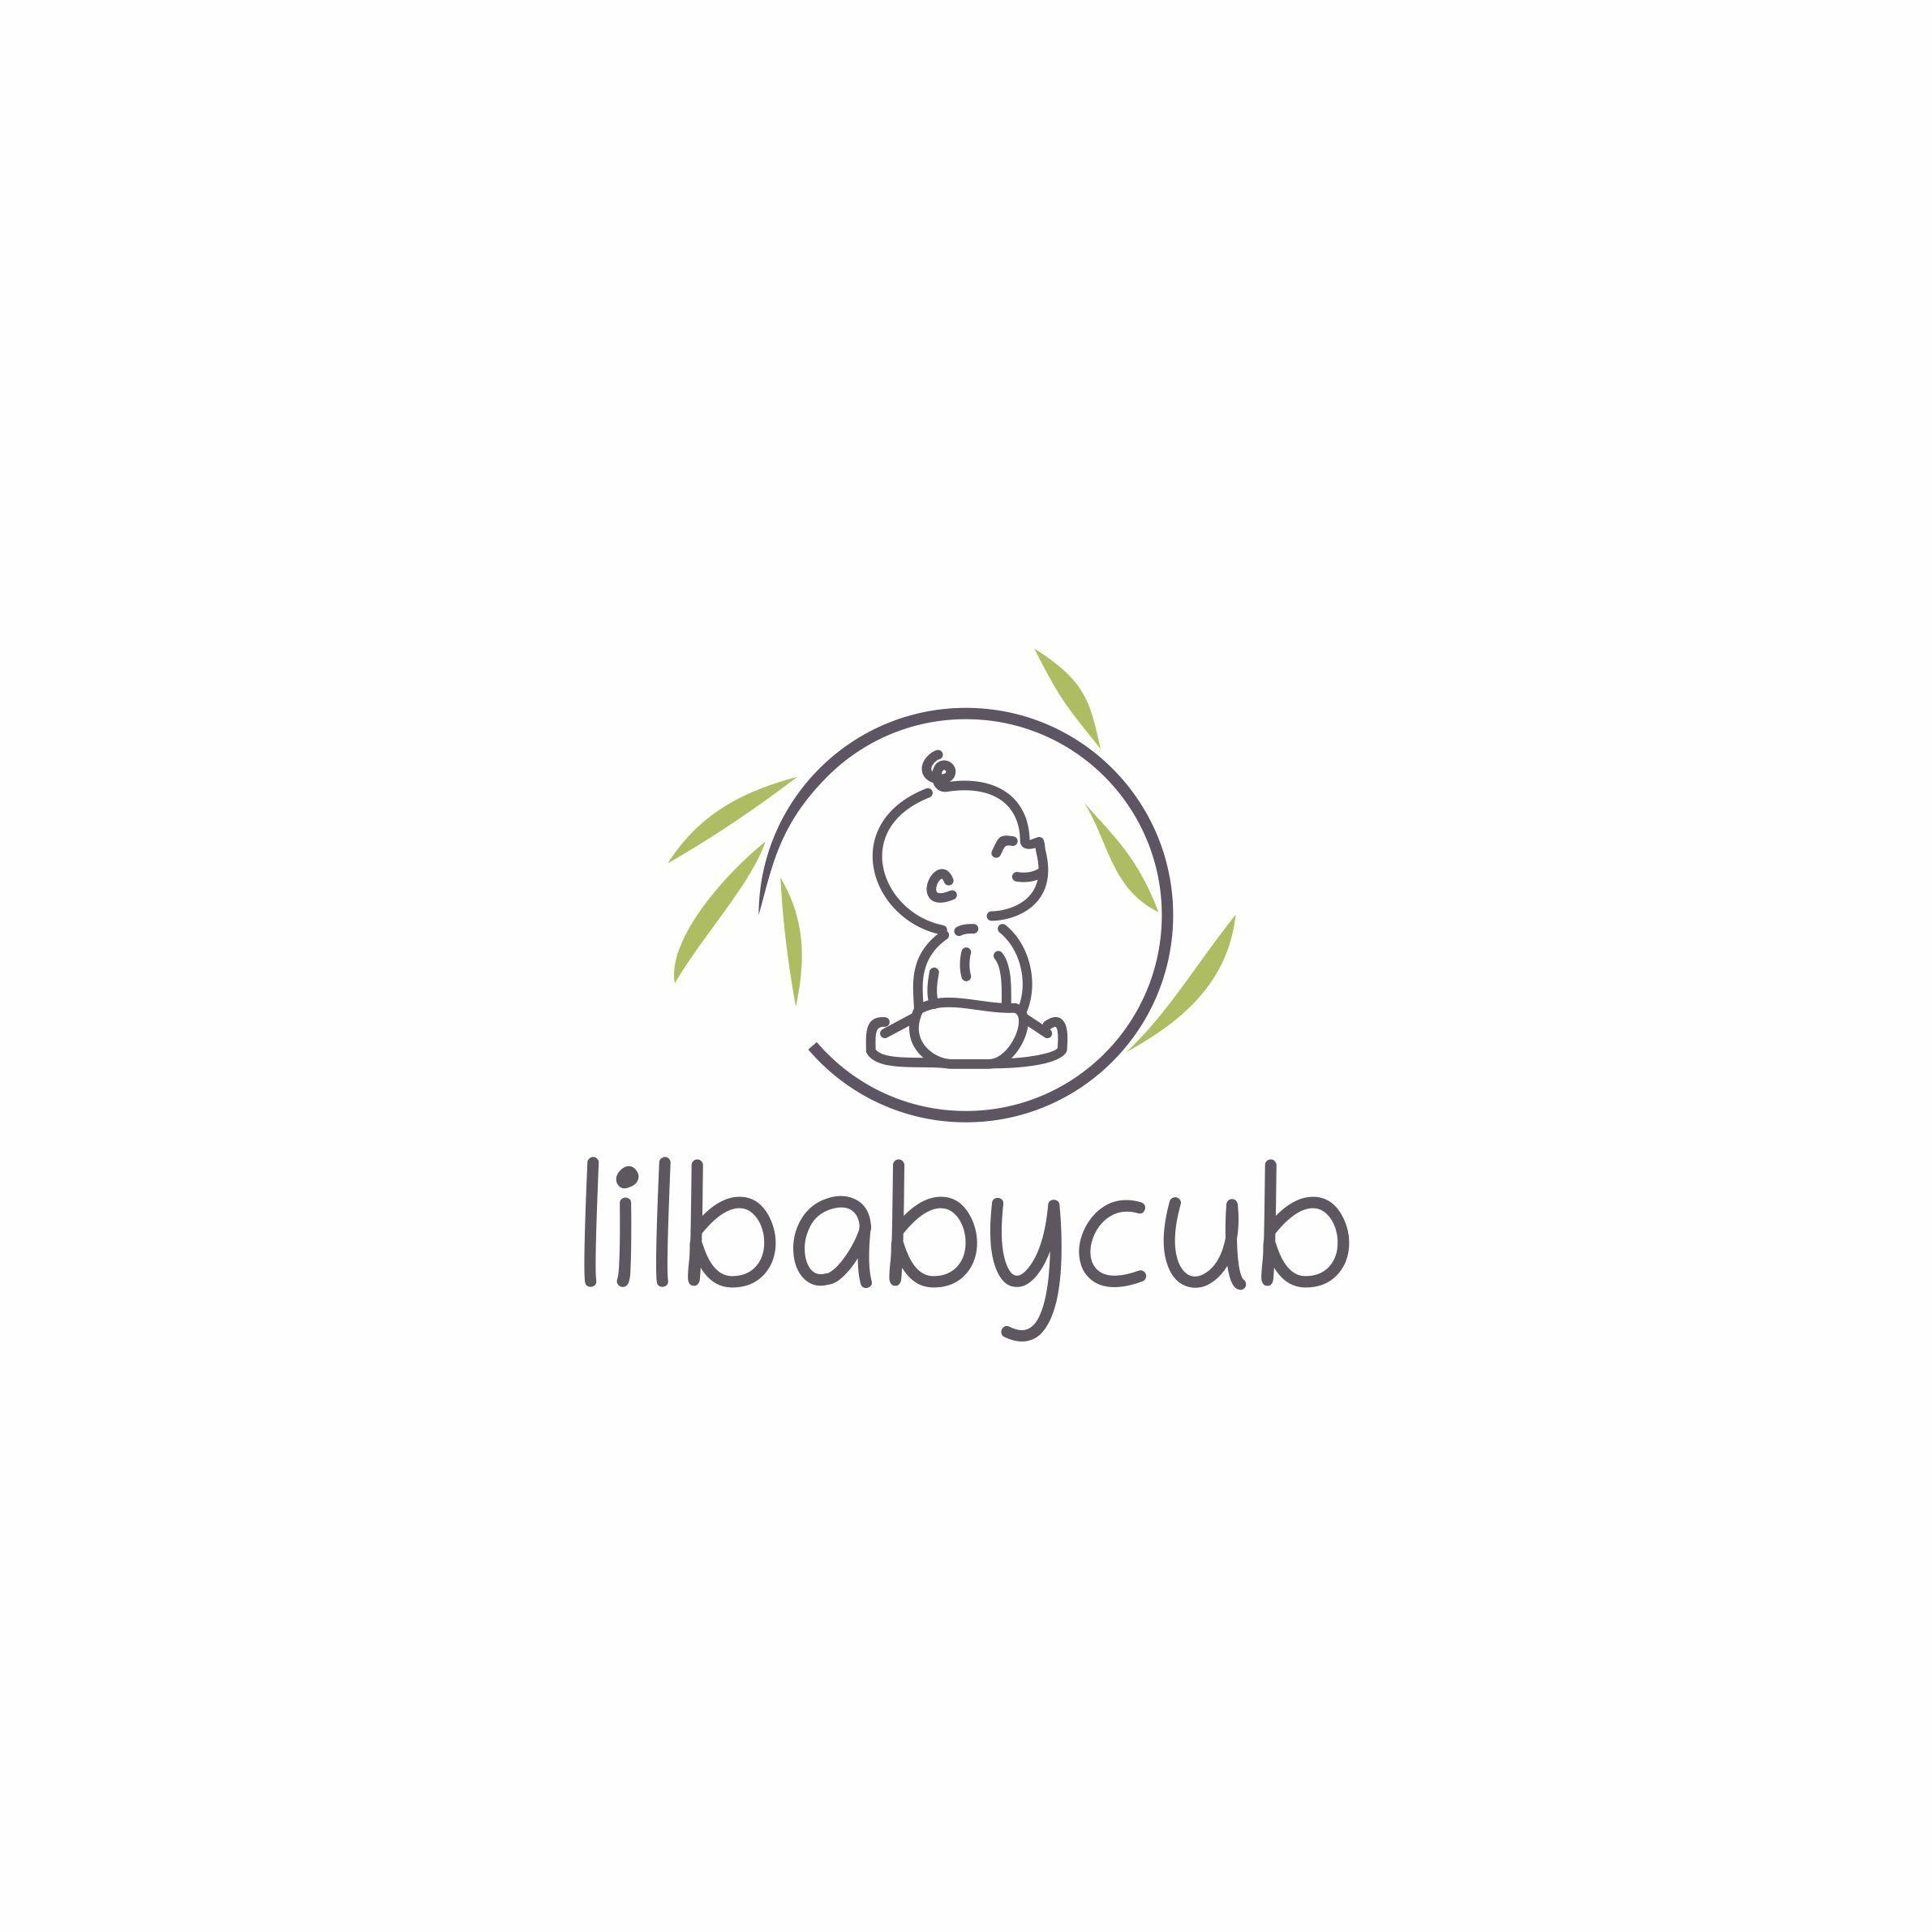 Single Design - lilbabycub - Noctrulicious